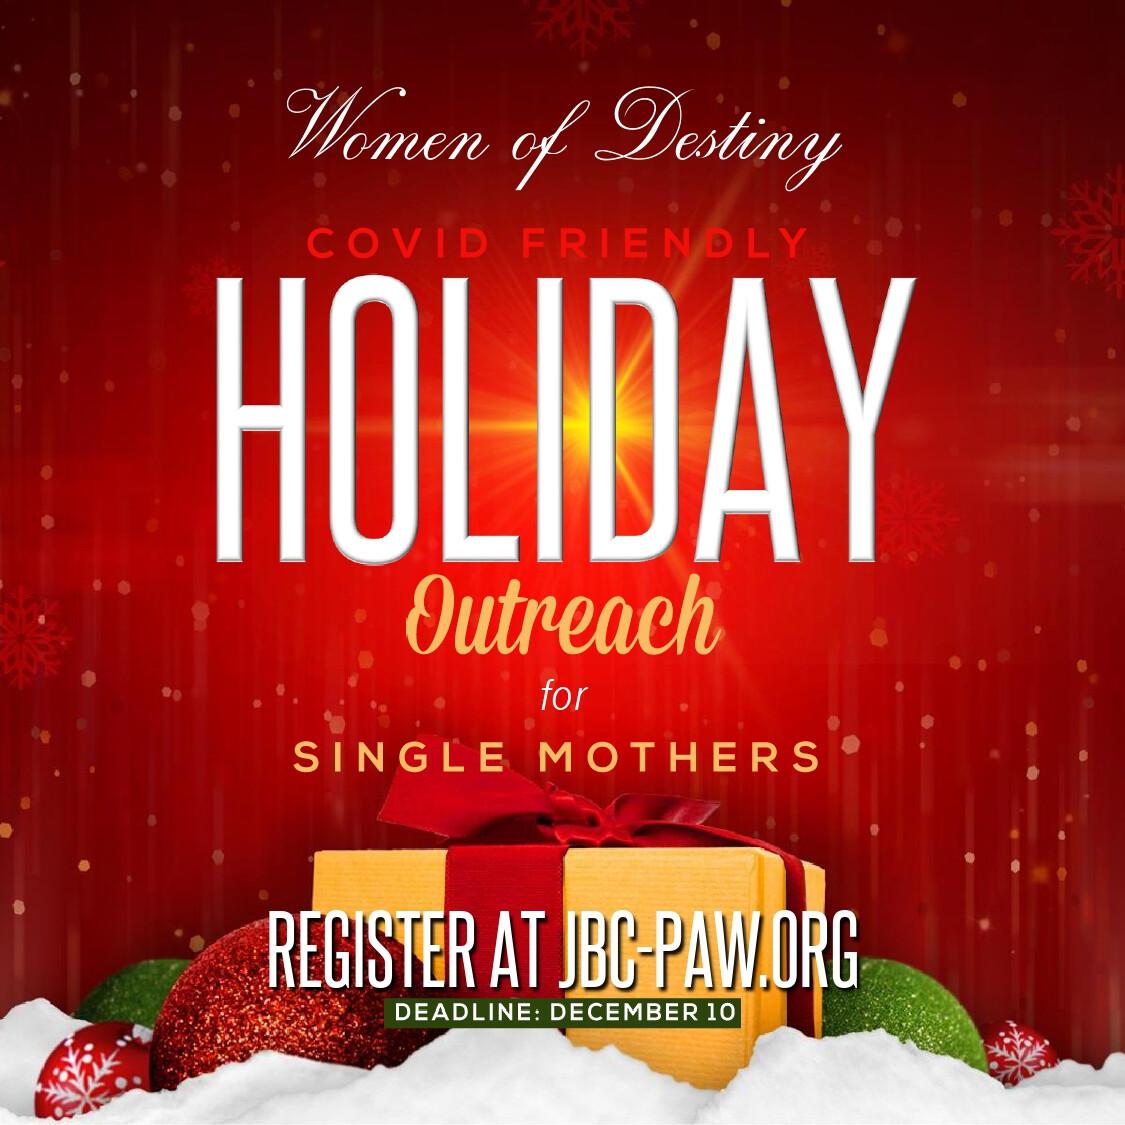 Women of Destiny COVID Friendly Holiday Outreach